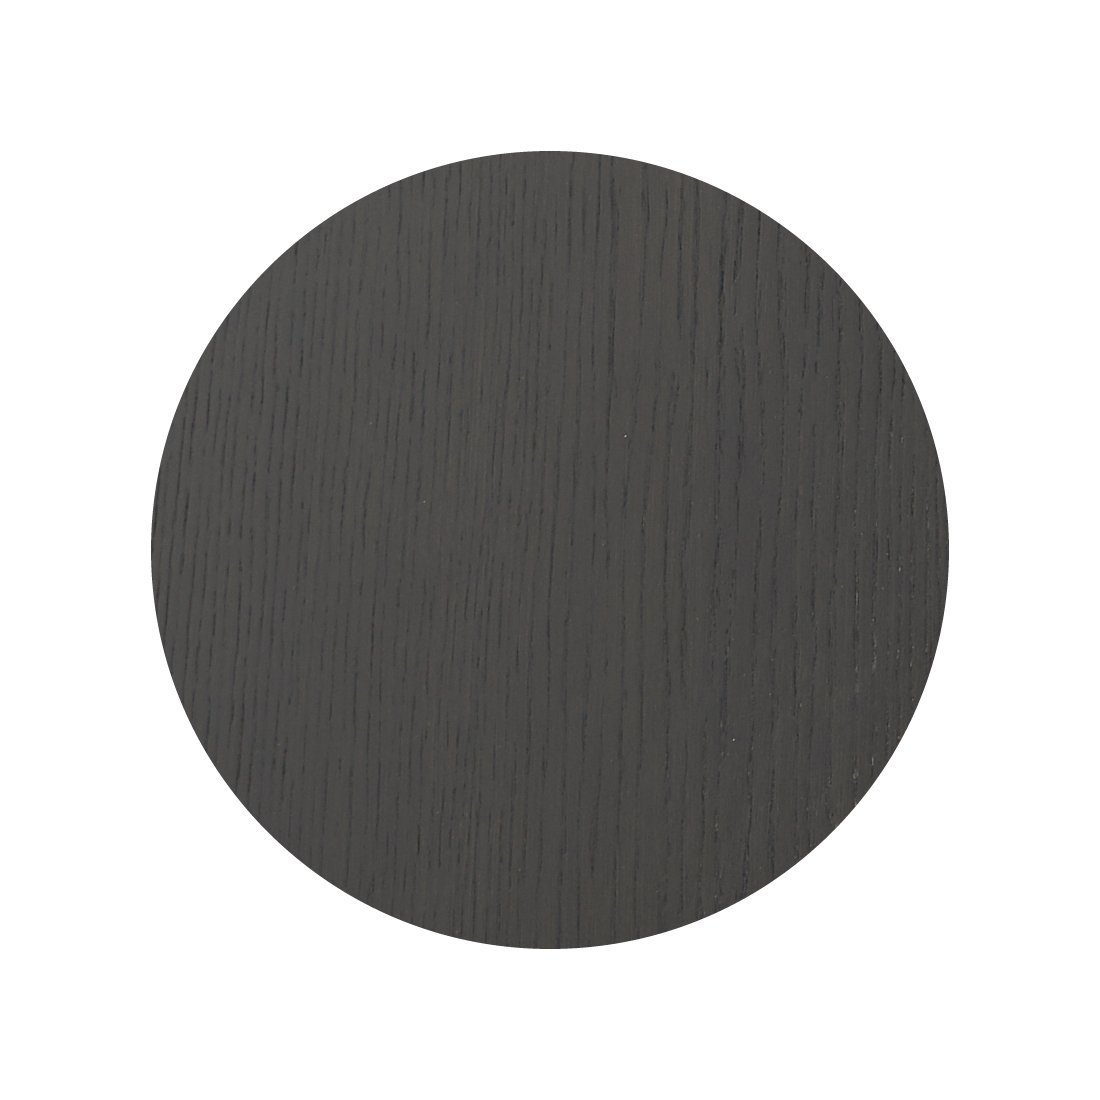 Spectrum Phill Eettafel 180 x 90 cm Antraciet